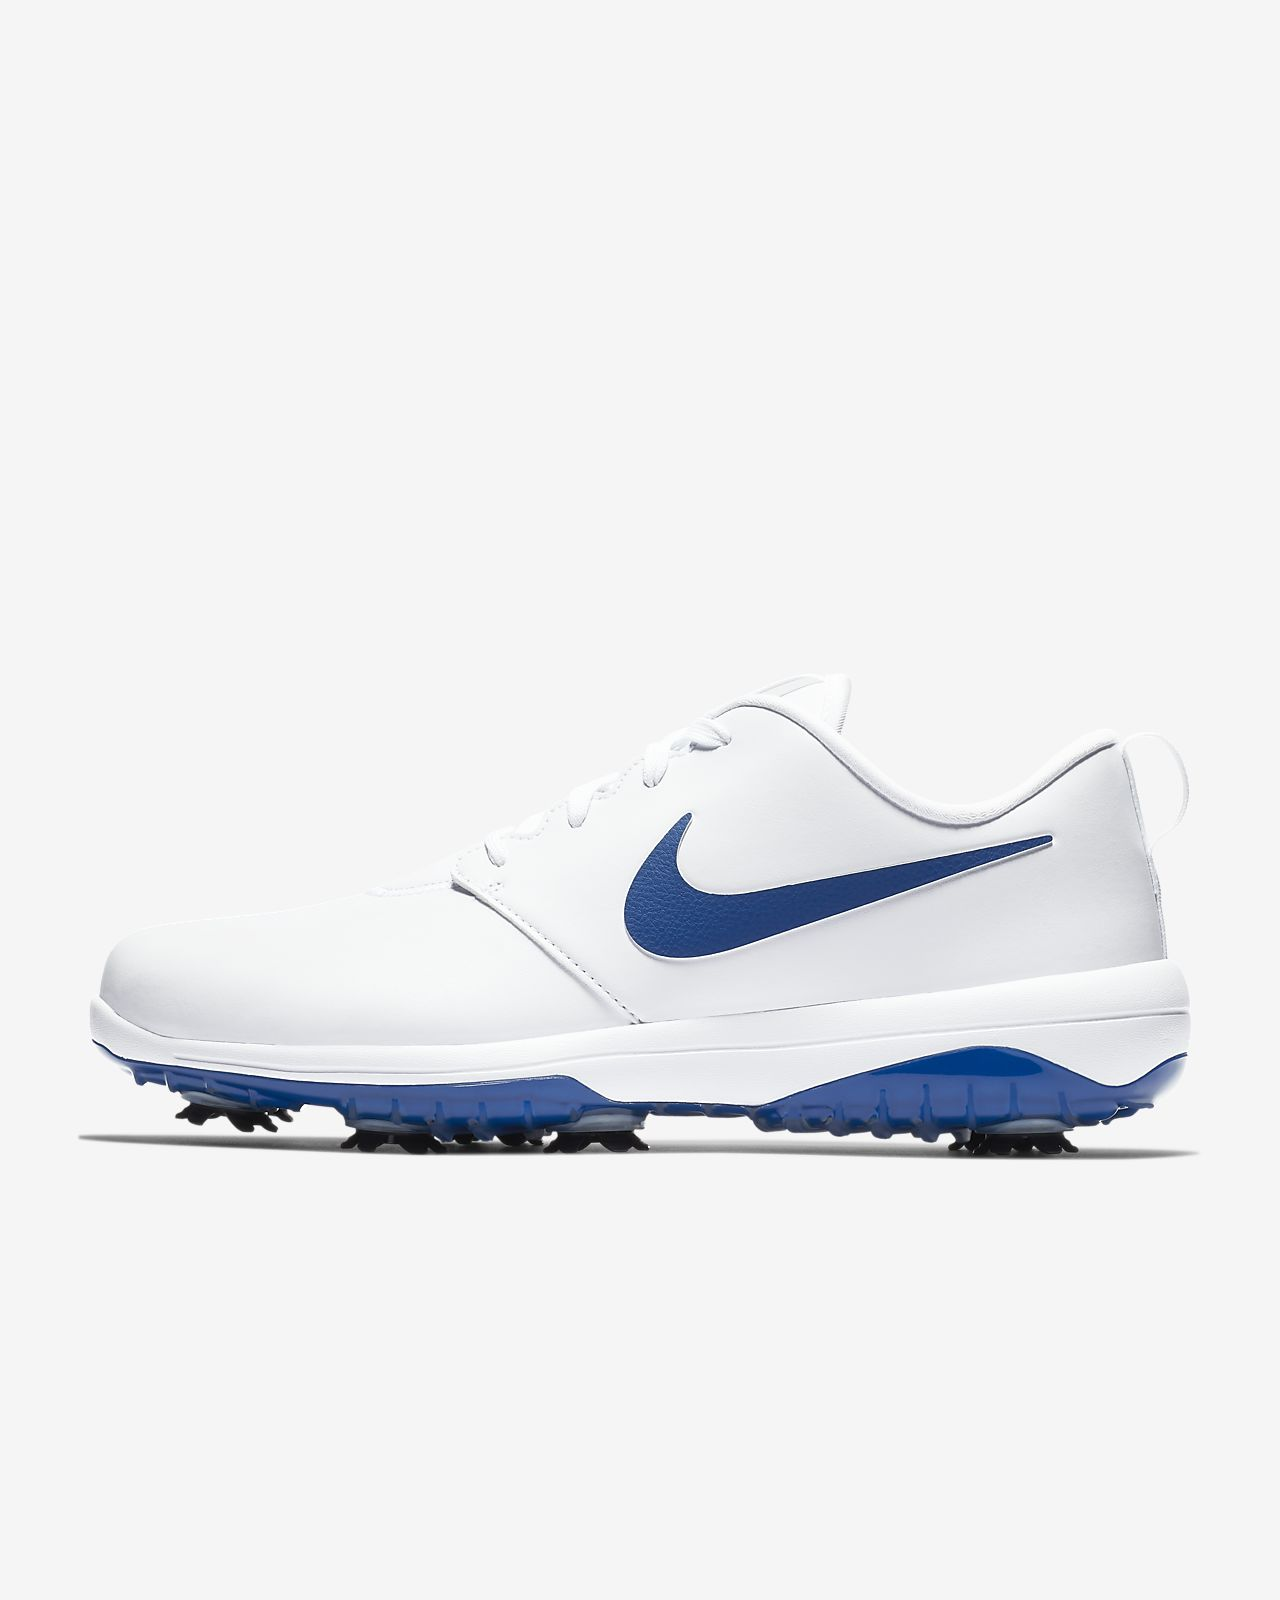 135f3a88e24c Nike Roshe G Tour Men s Golf Shoe. Nike.com CA